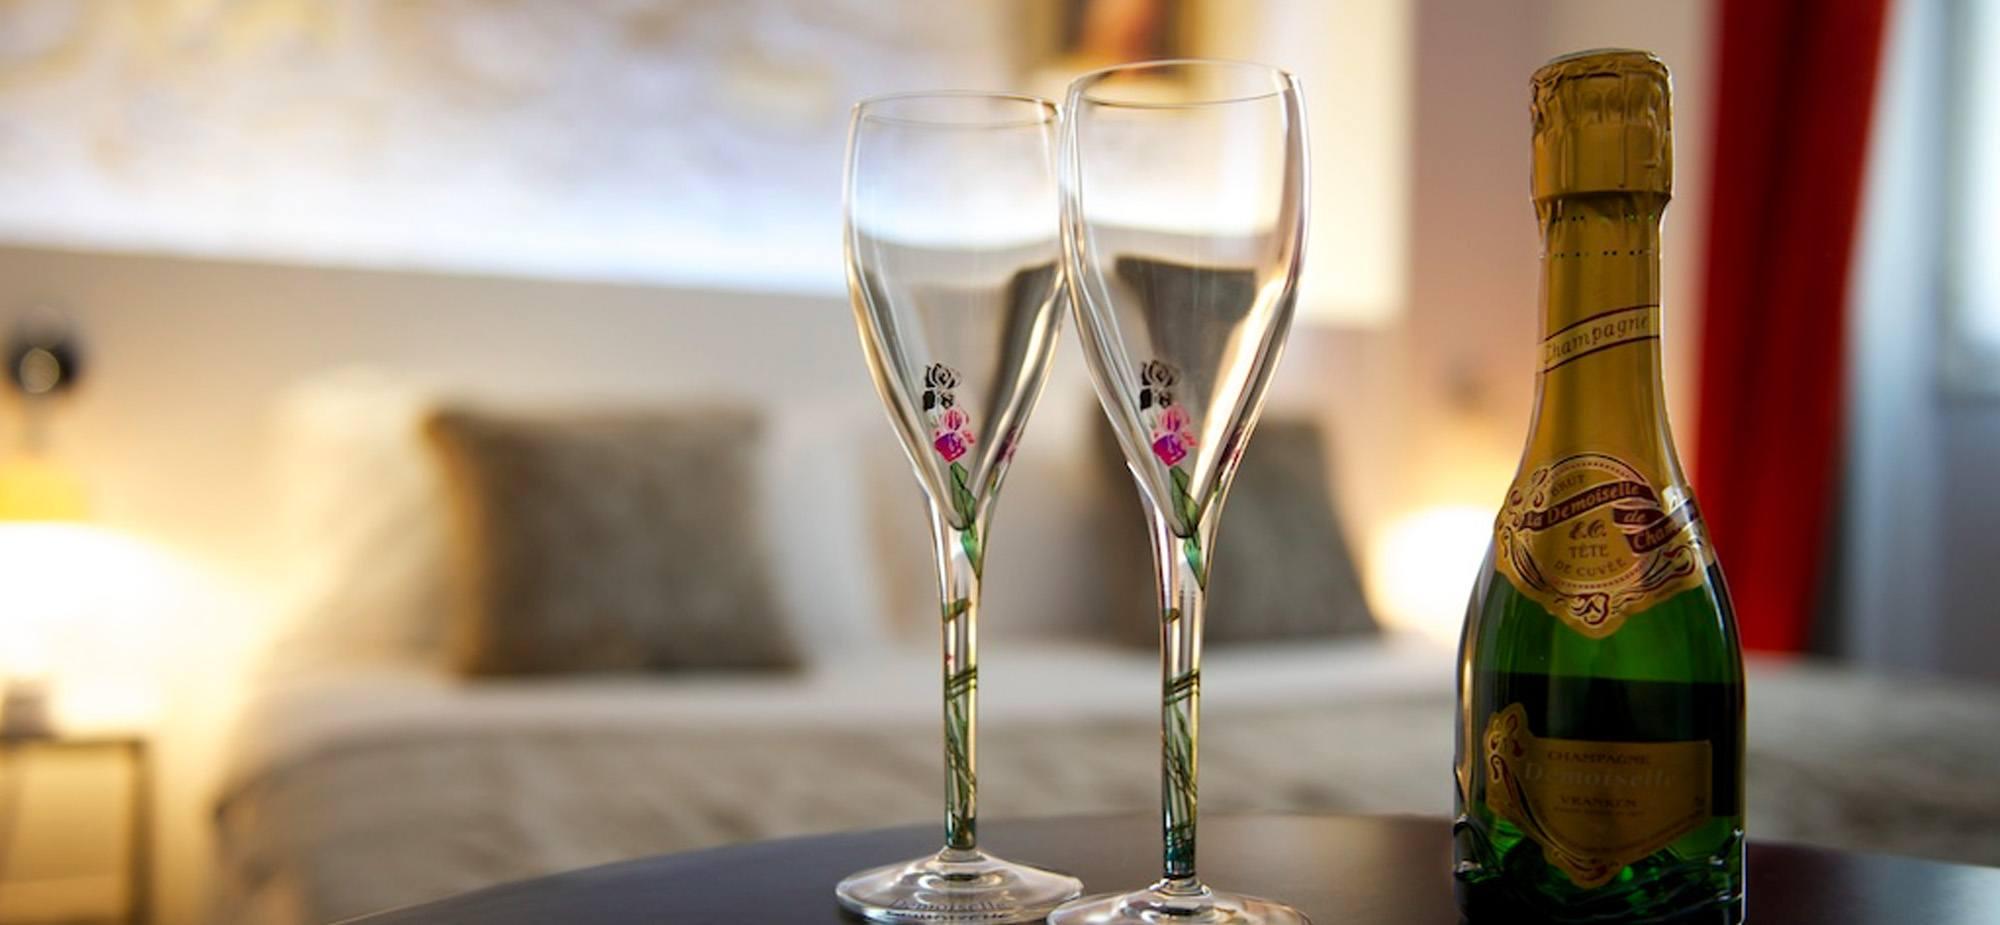 offre-champagne-hotel-le-clos-notre-dame